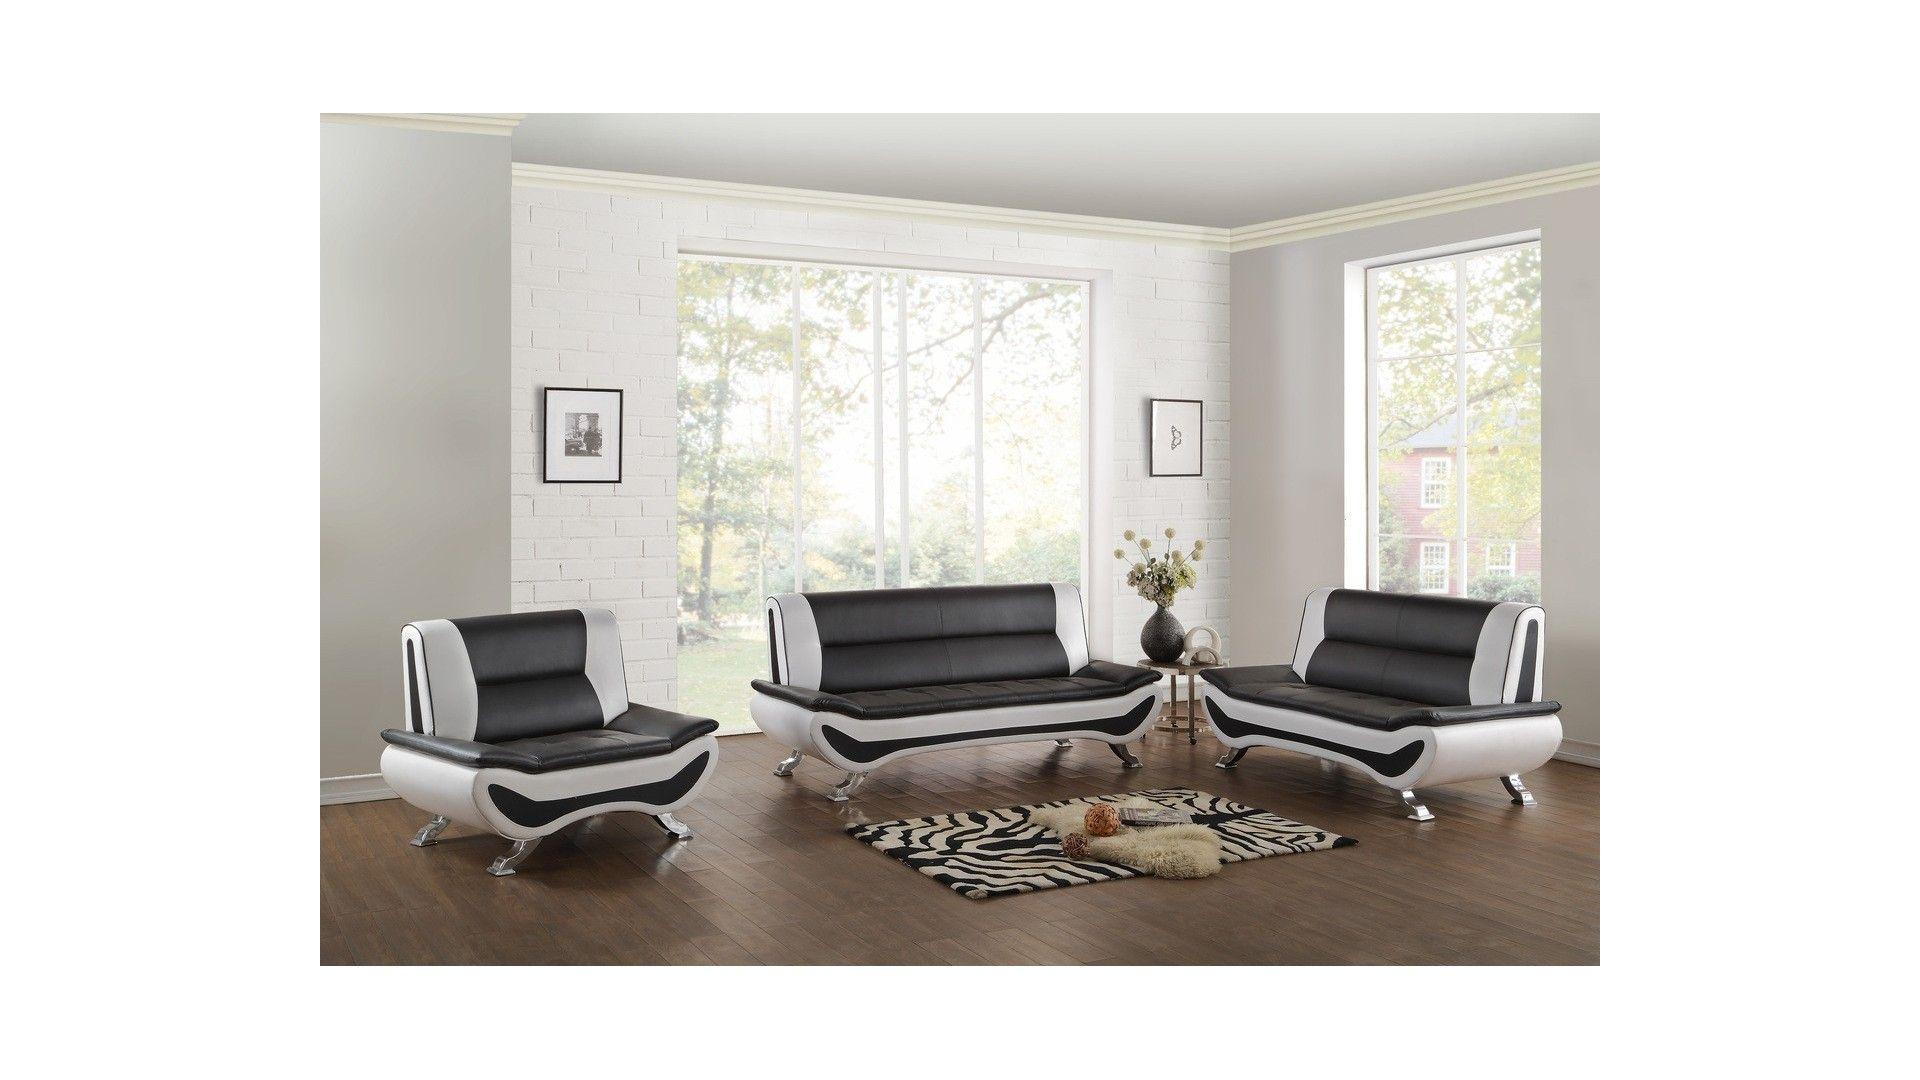 11 Smart Designs Of How To Make 3 Piece Living Room Set Cheap In 2021 3 Piece Living Room Set Living Room Sets Modern Living Room Set